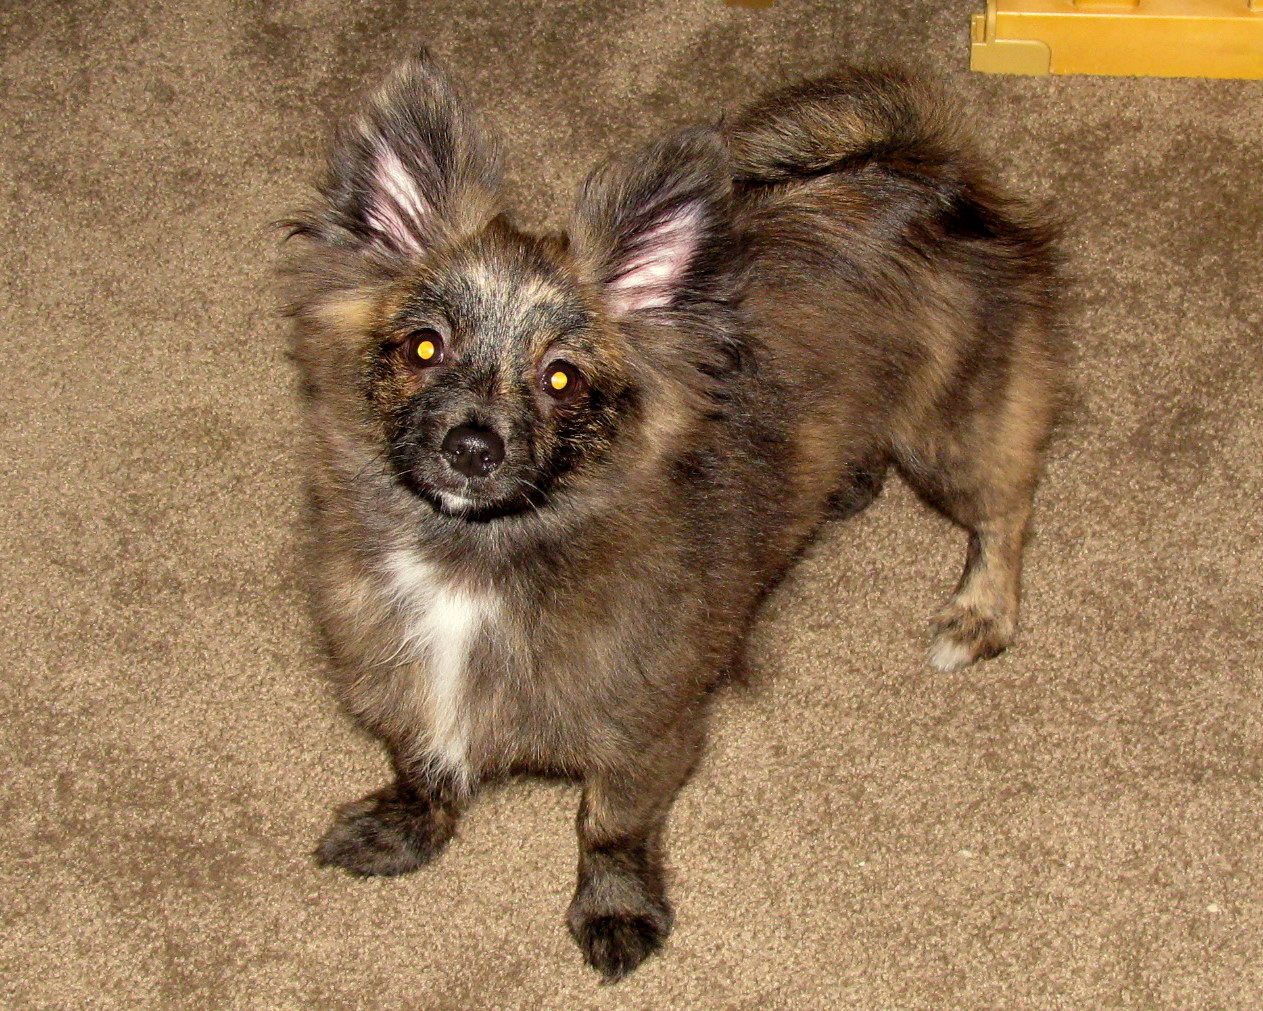 Top 12 Cutest Pomeranian Mix Dog Breeds - Puppies Club |Long Chihuahua Dachshund Pomeranian Mix